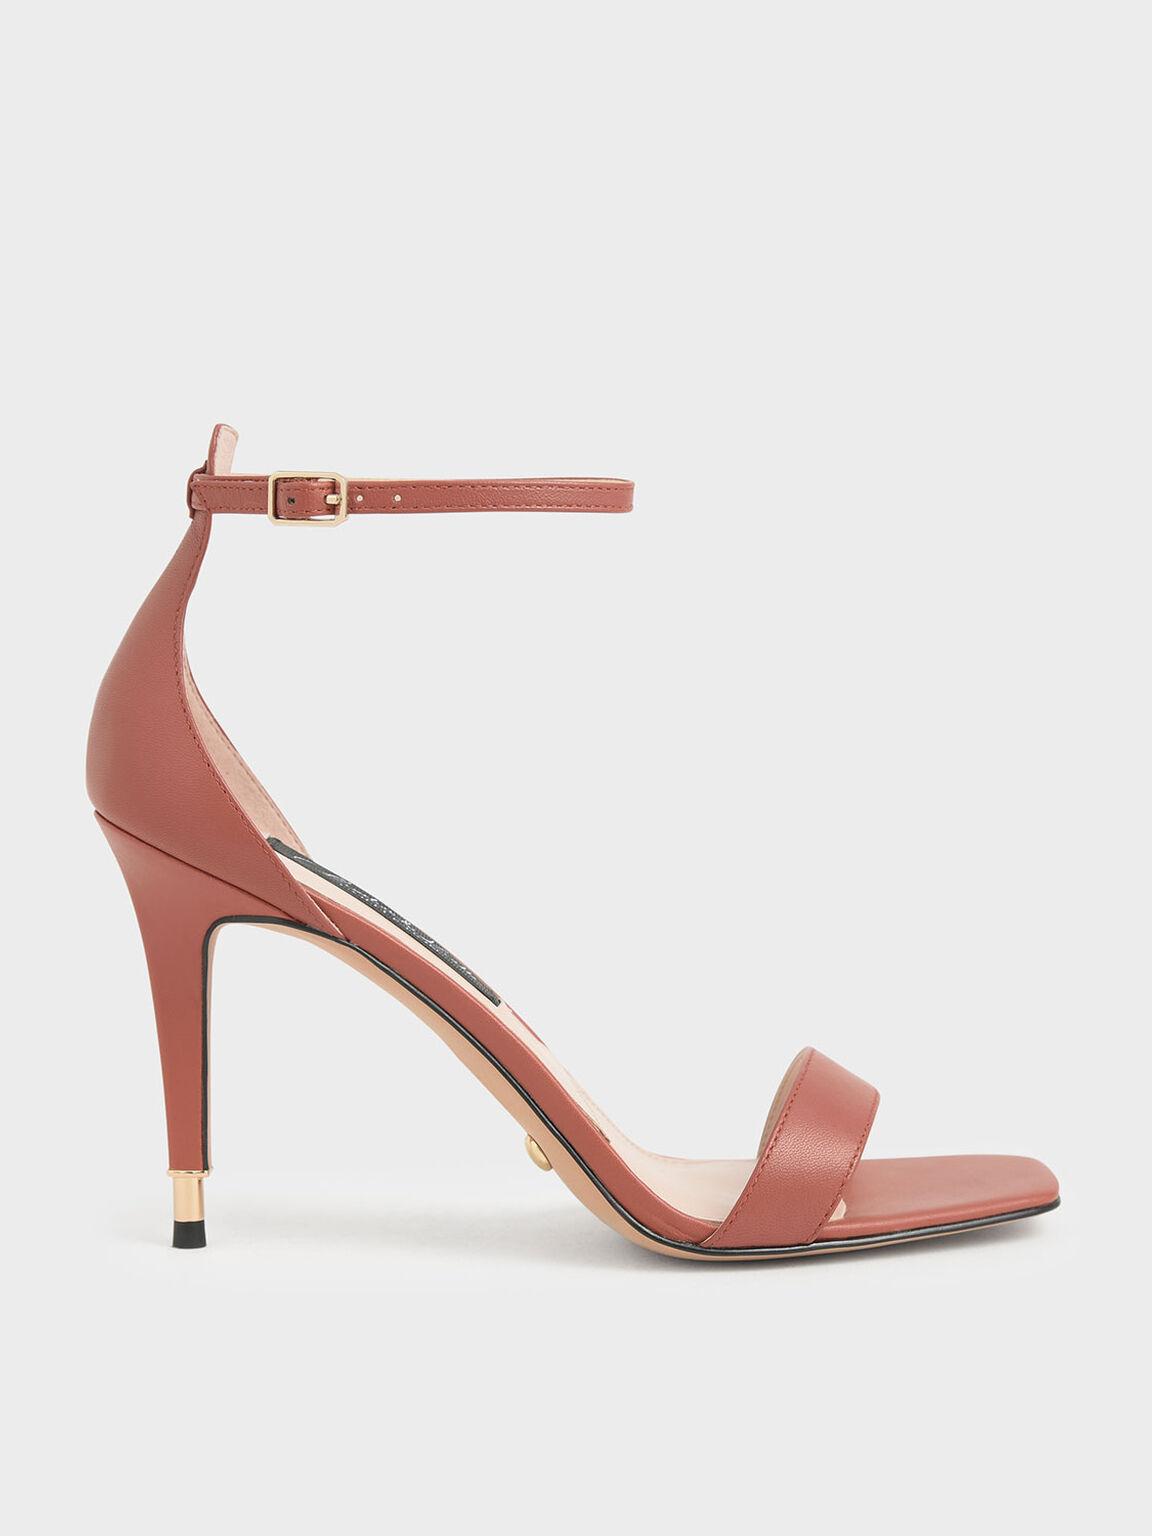 Leather Stiletto Heels, Brick, hi-res